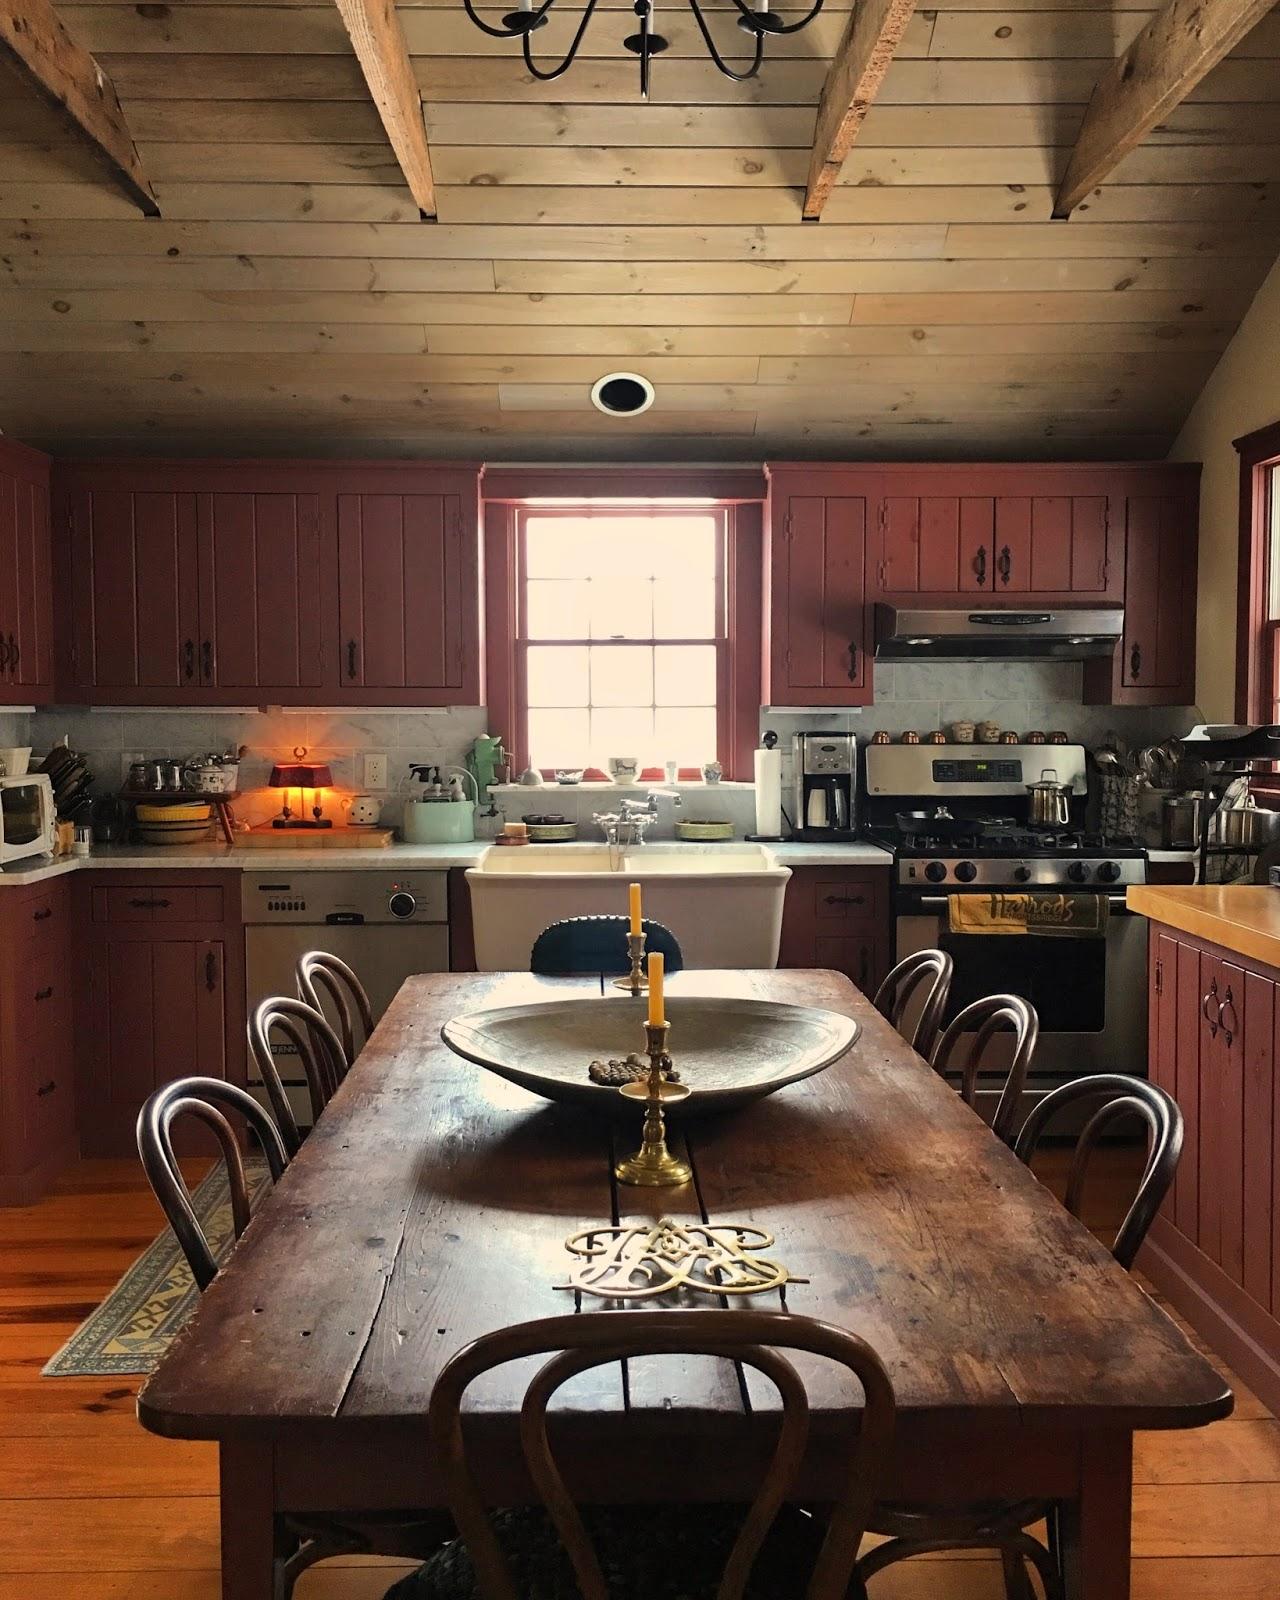 My Cottage Kitchen W/ Farm Table